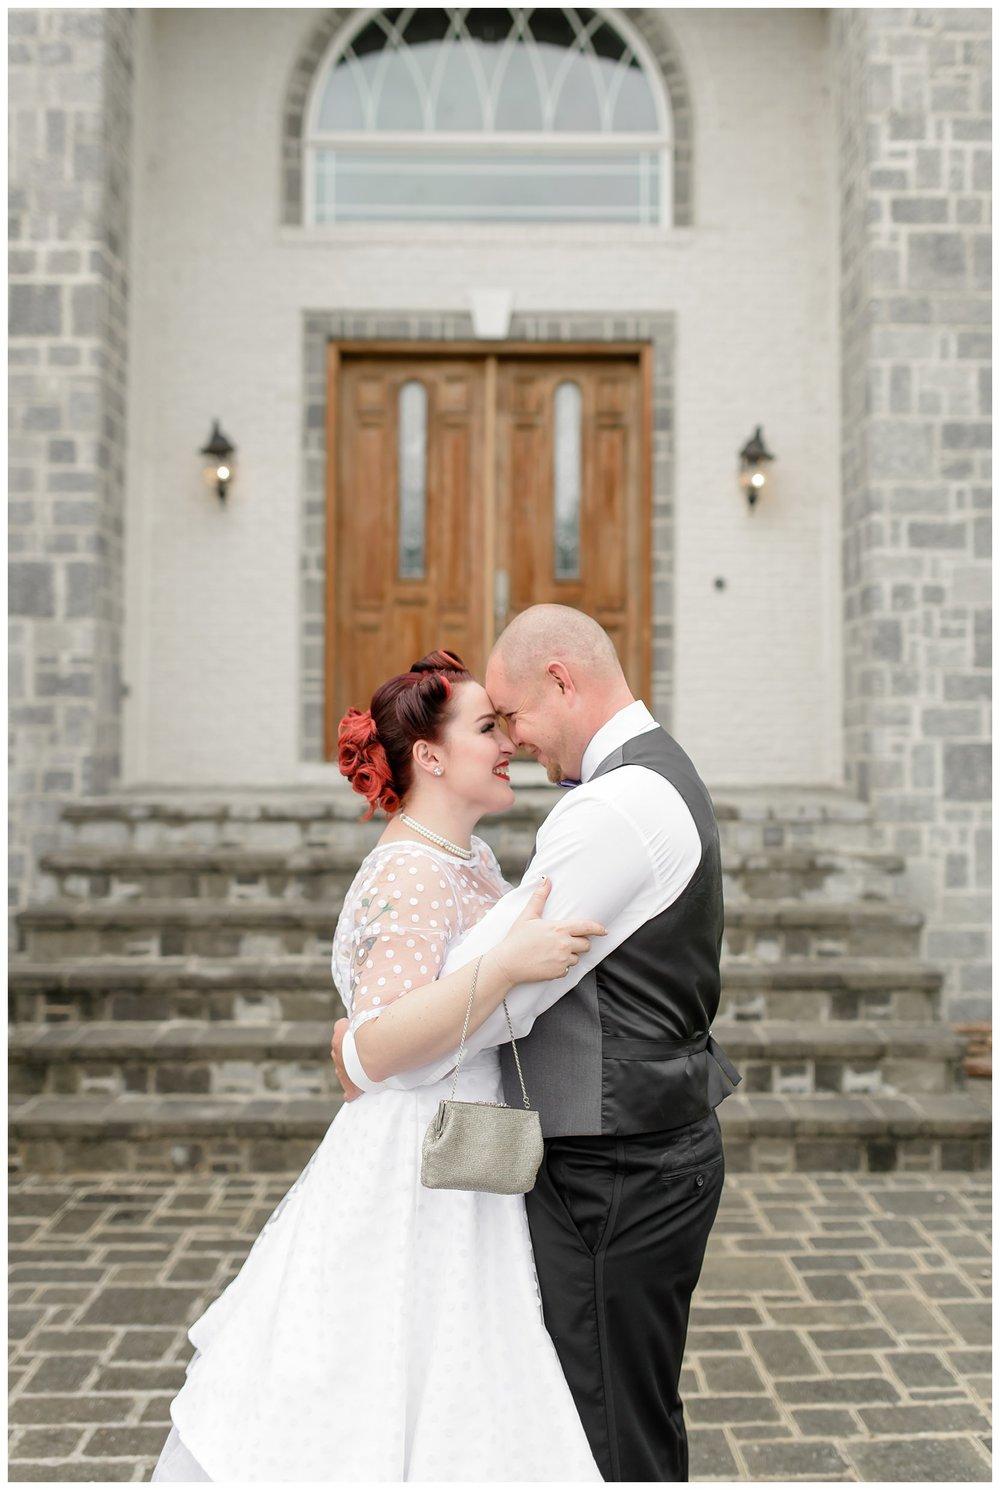 Charleston-South-Carolina-Wedding-Photographer-Engagement-Photography-green-eco-friendly-stephanie-kopf-photography-40.jpg